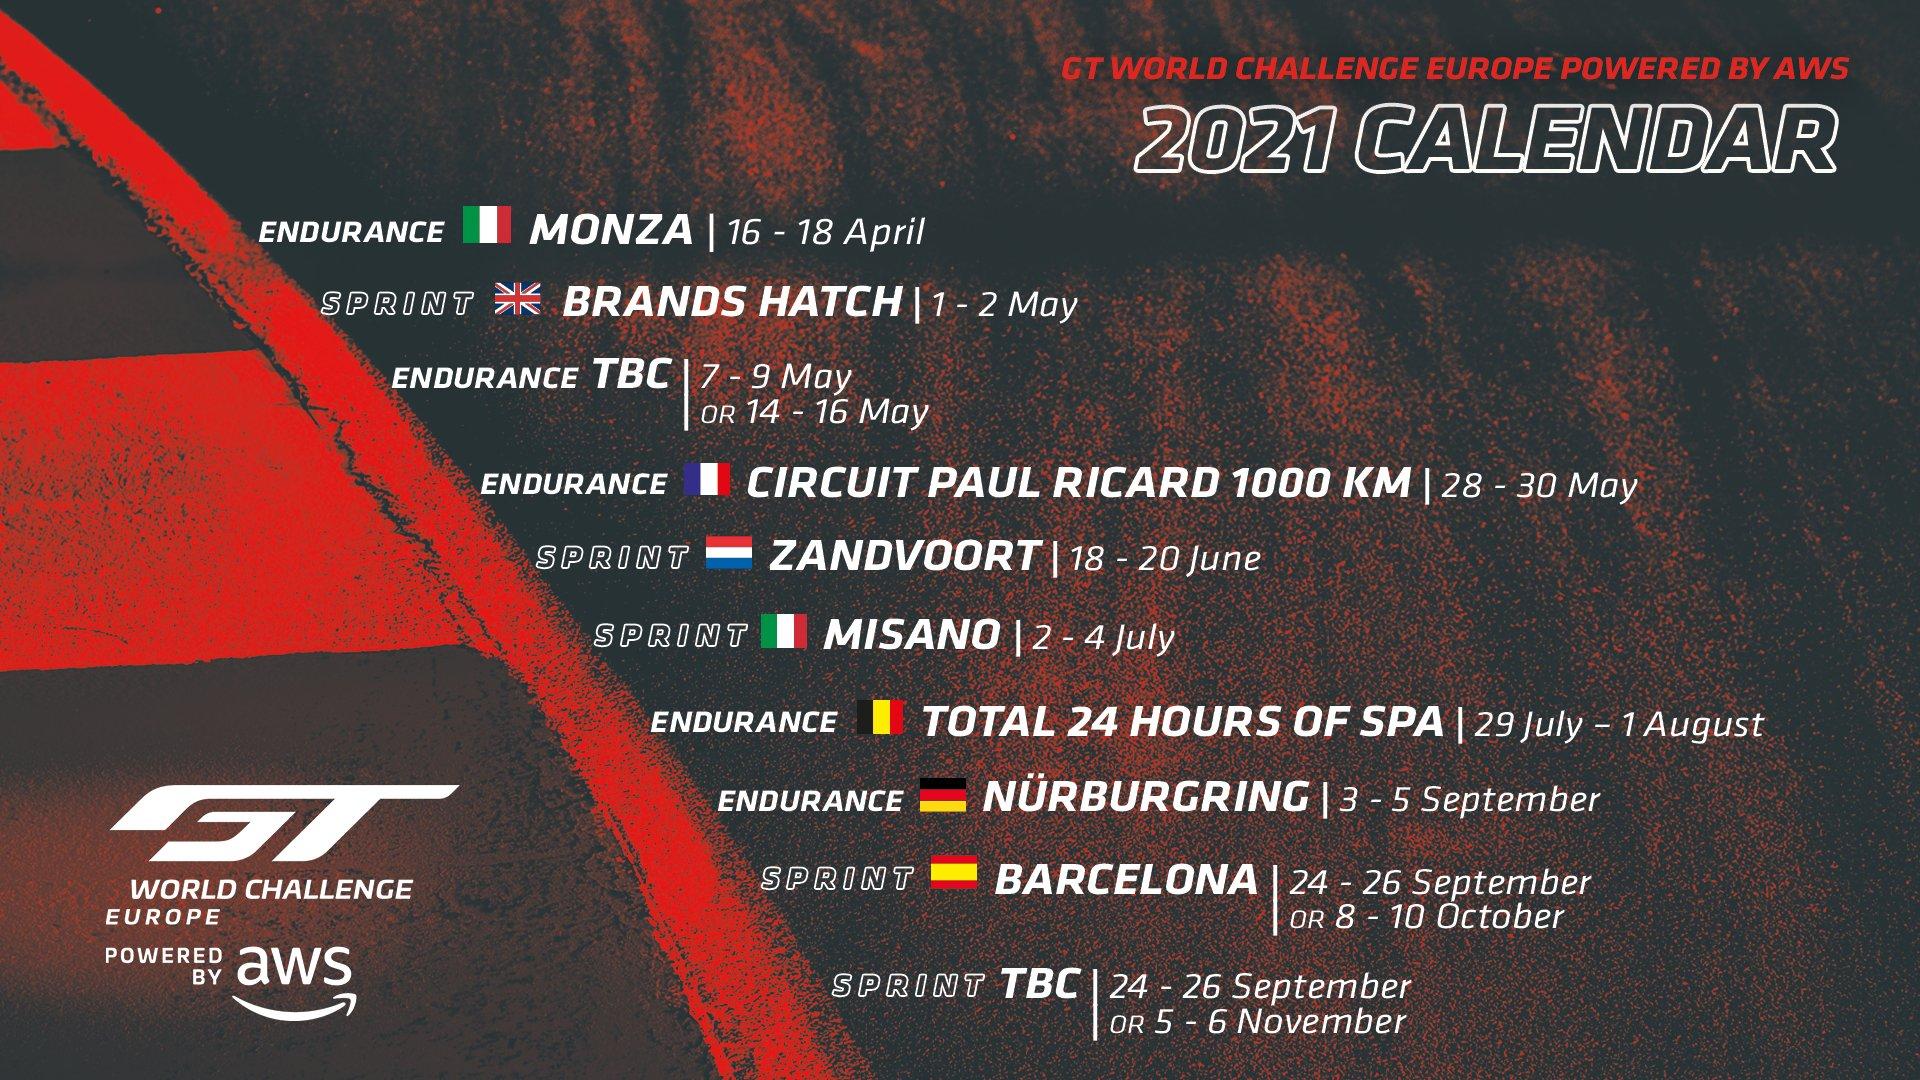 GT World Challenge   Le calendrier 2021 du GT World Challenge